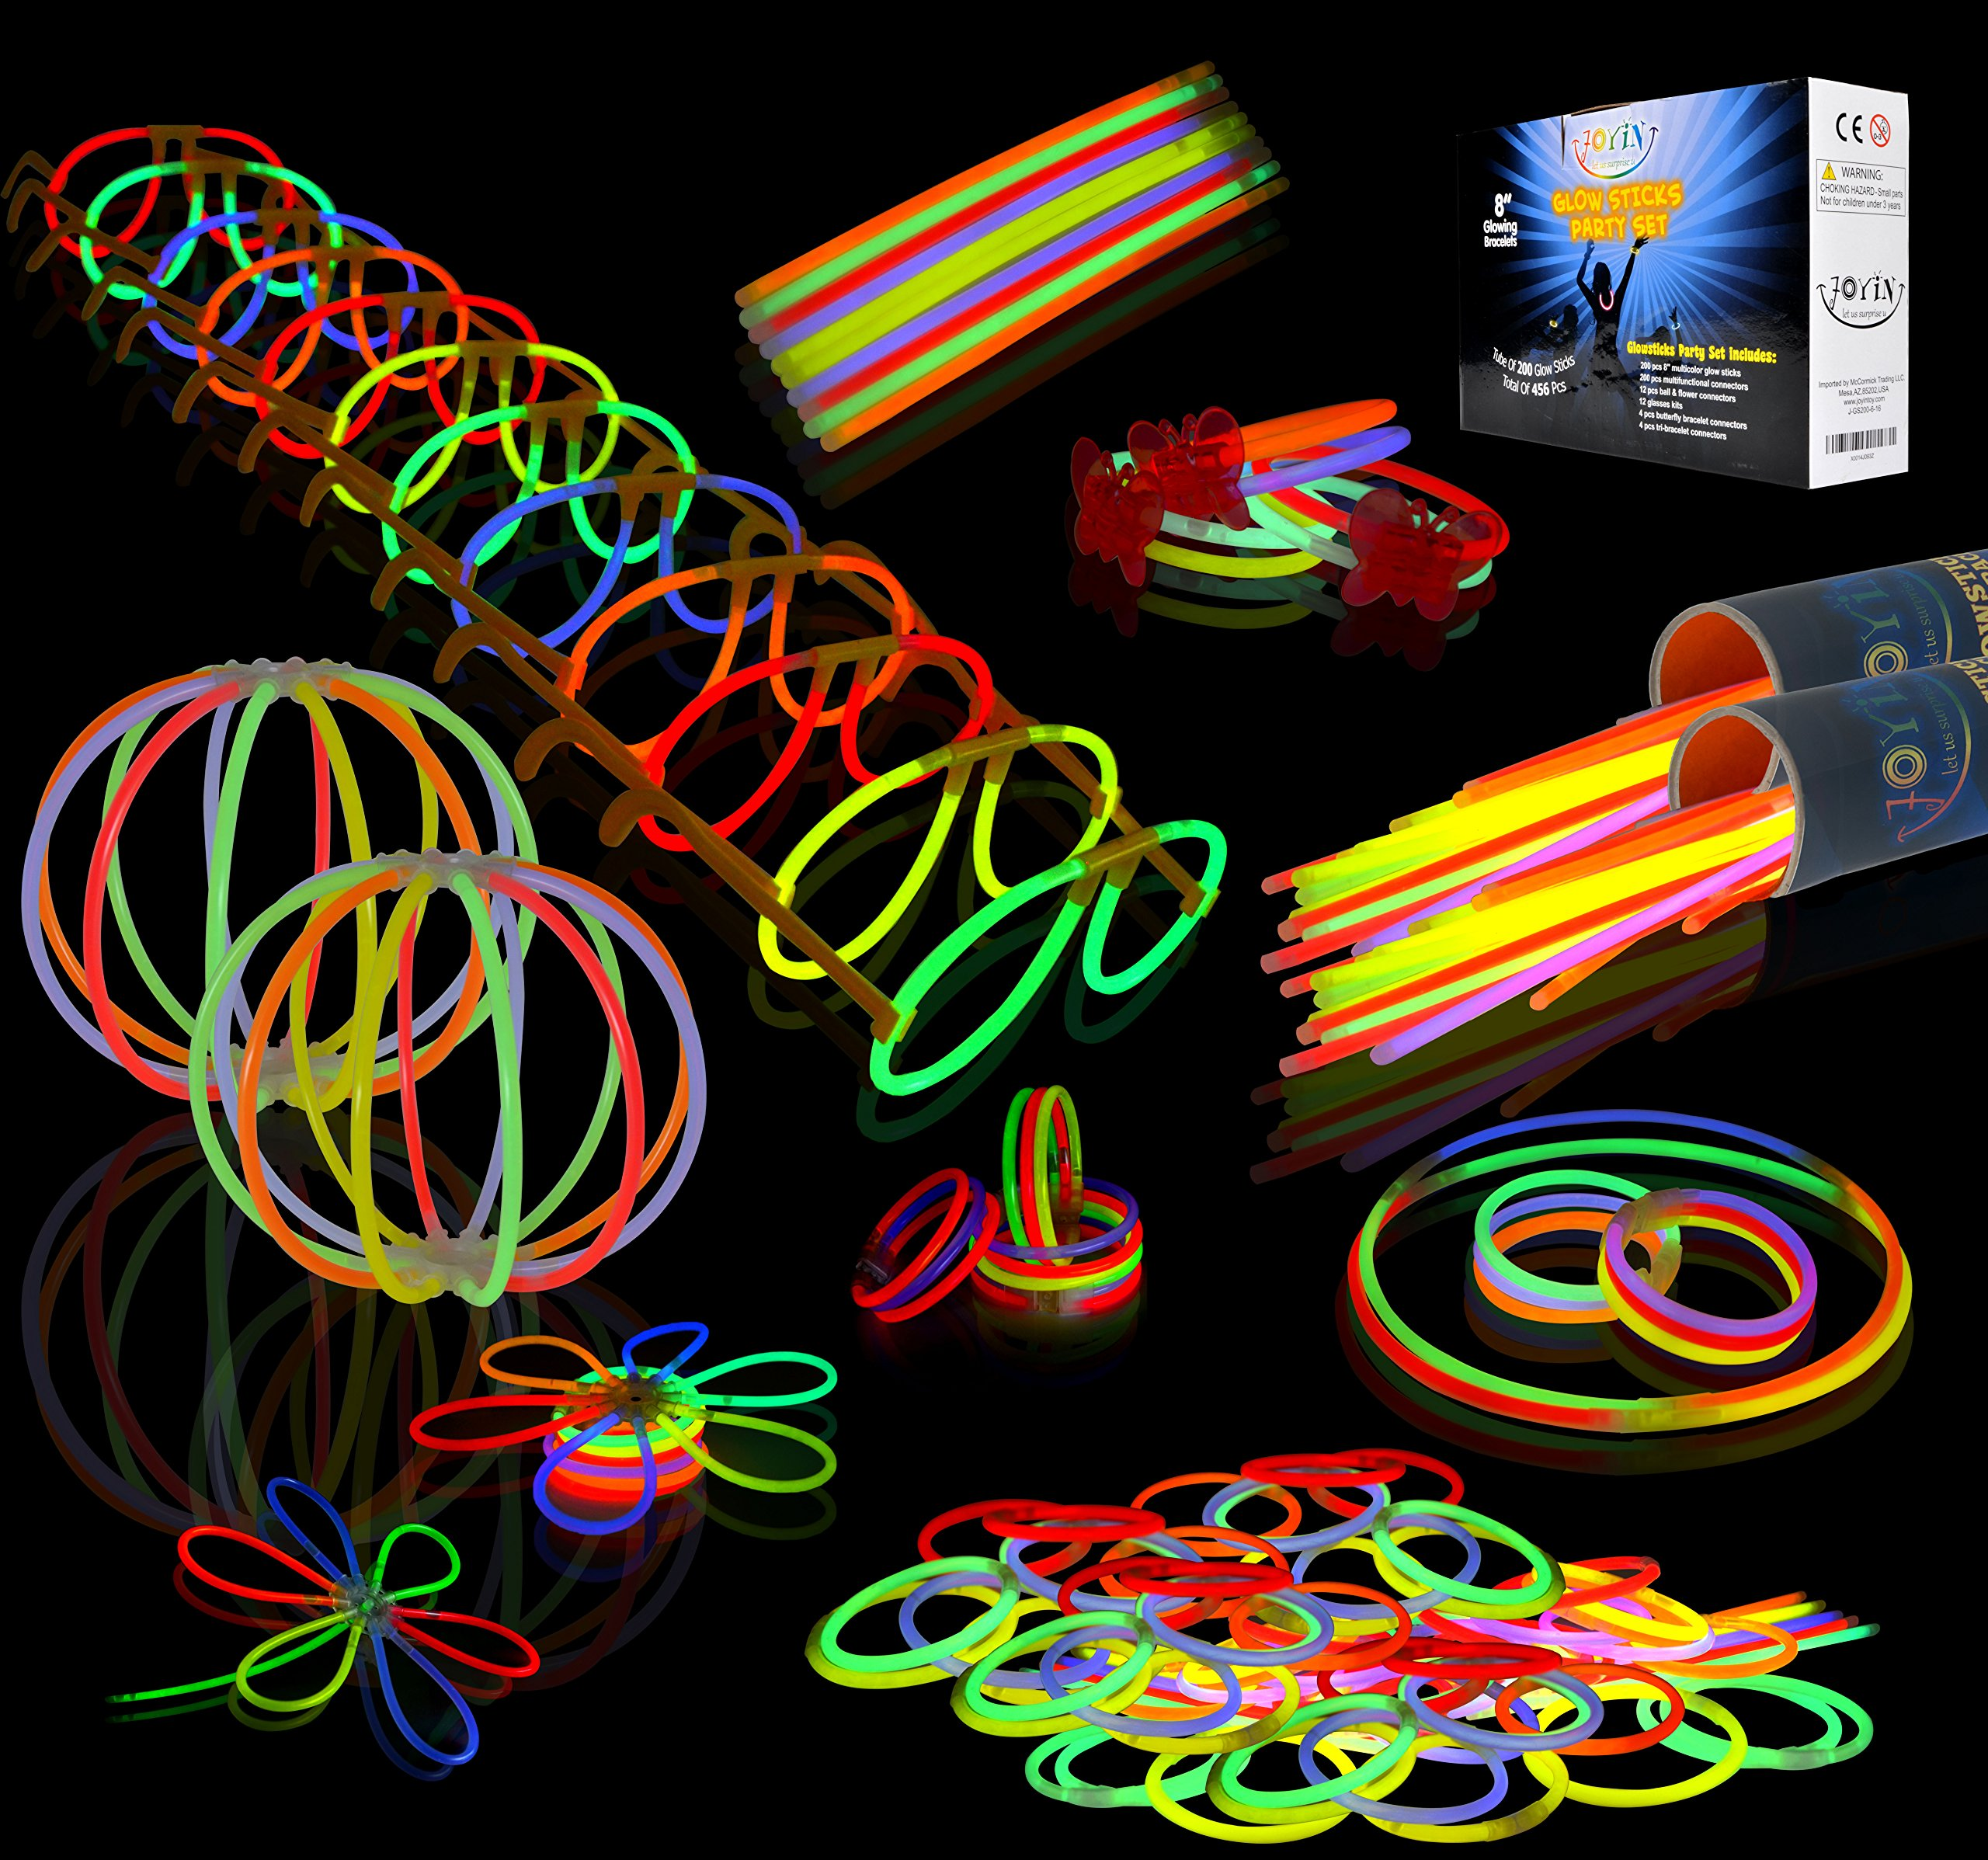 JOYIN Glow Sticks Bulk 200 8'' Glowsticks (Total 456 PCs 7 Colors); Bracelets Glow Necklaces Glow-in-The-Dark Light-up July 4th Halloween Party Supplies Pack by JOYIN